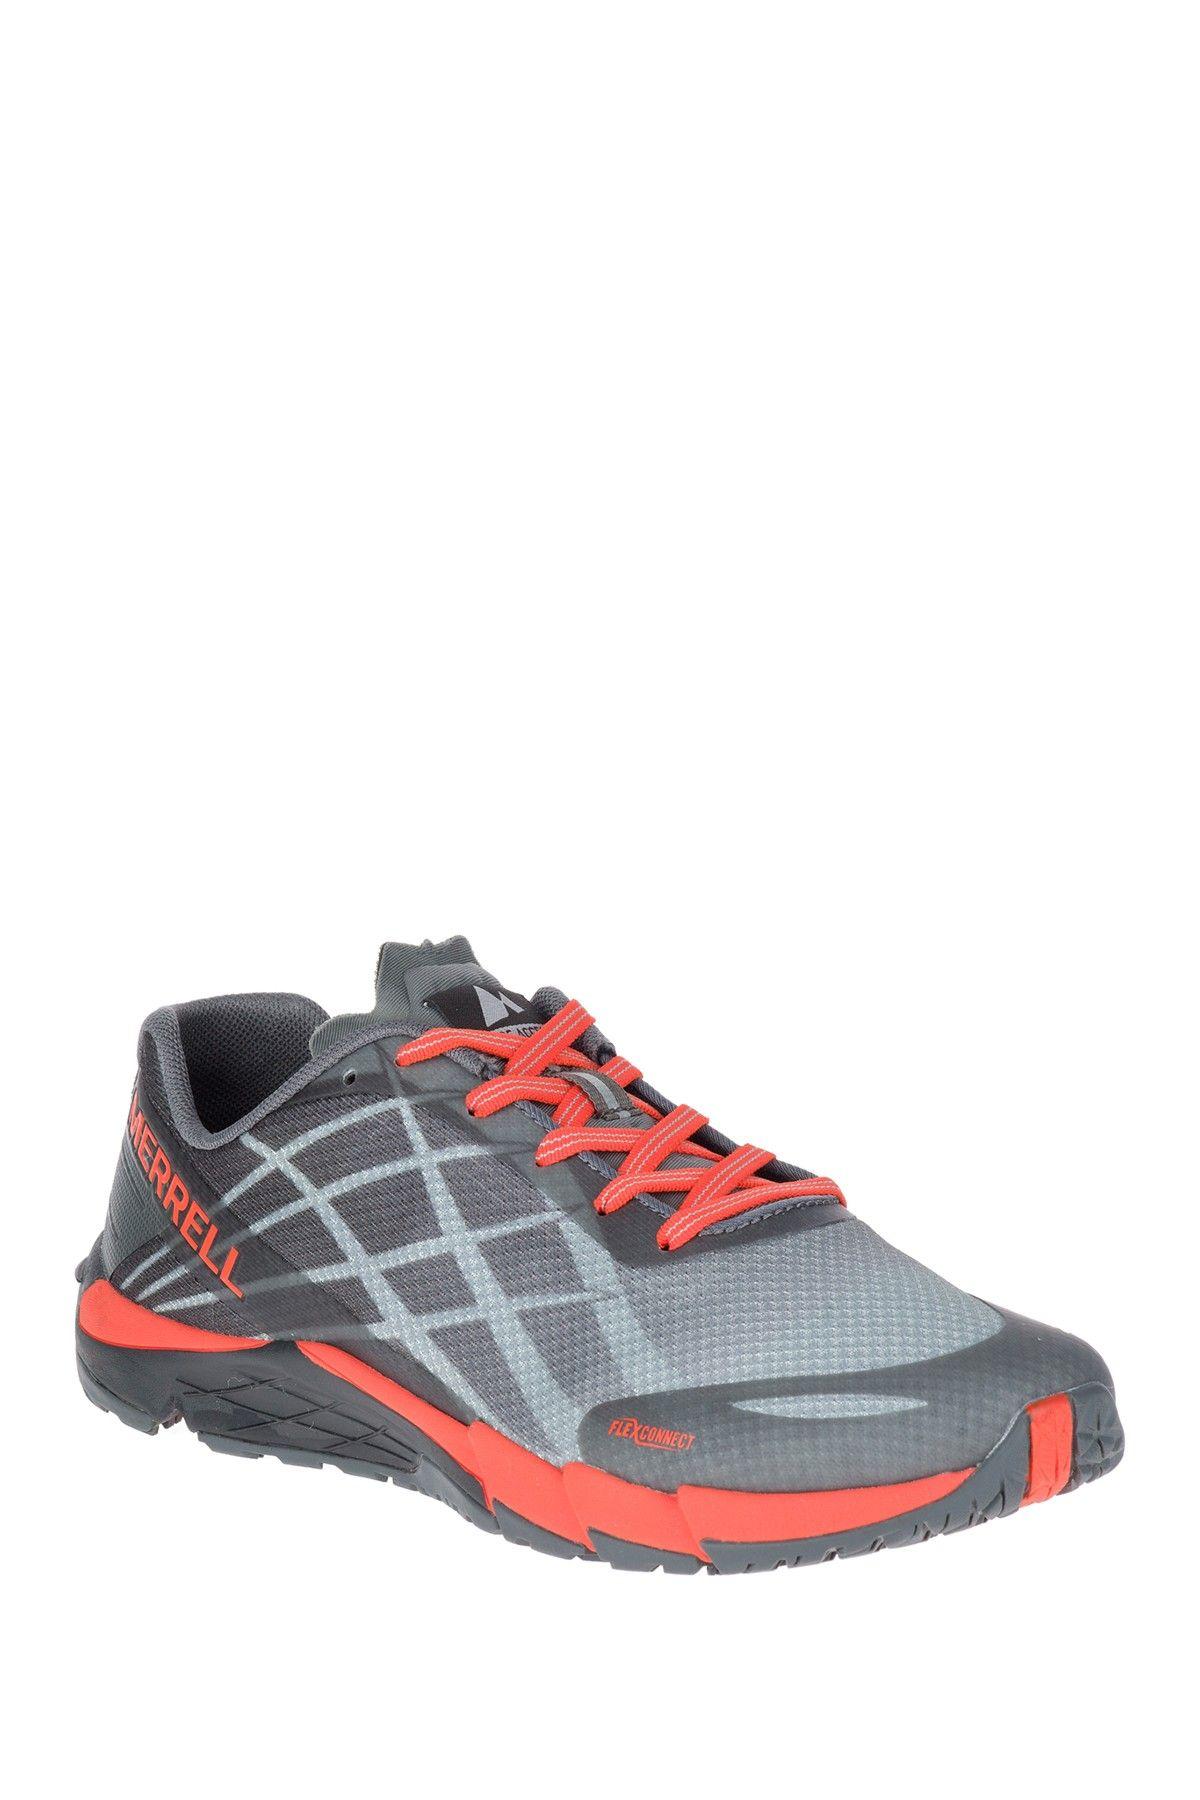 Nike Air Max Plus Turbo GreenWhiteBlue Gradient   SneakerFiles